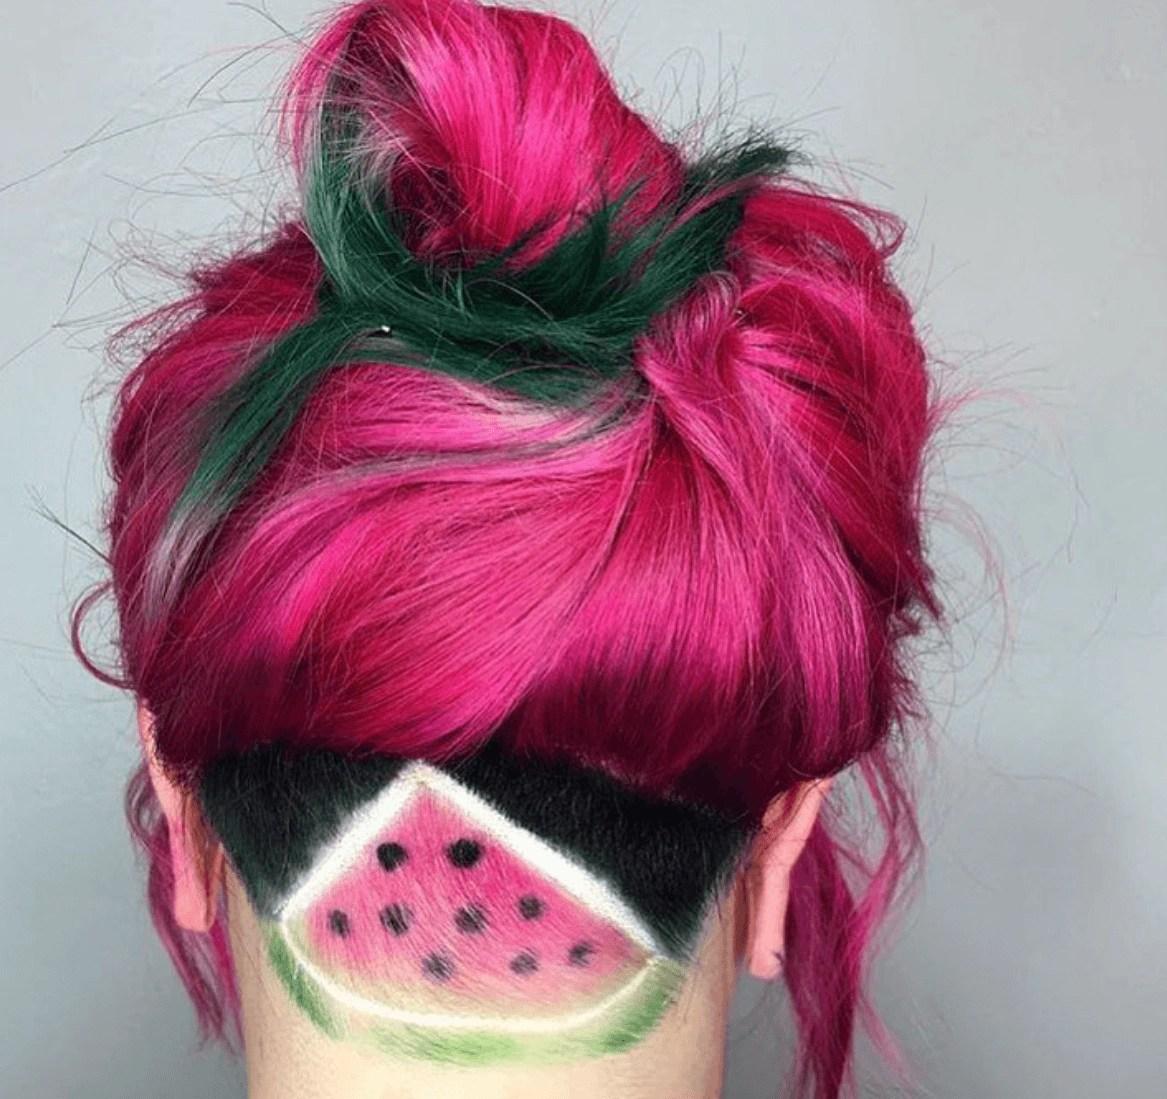 Watermelon Hair The Latest Food Inspired Hair Color Craze